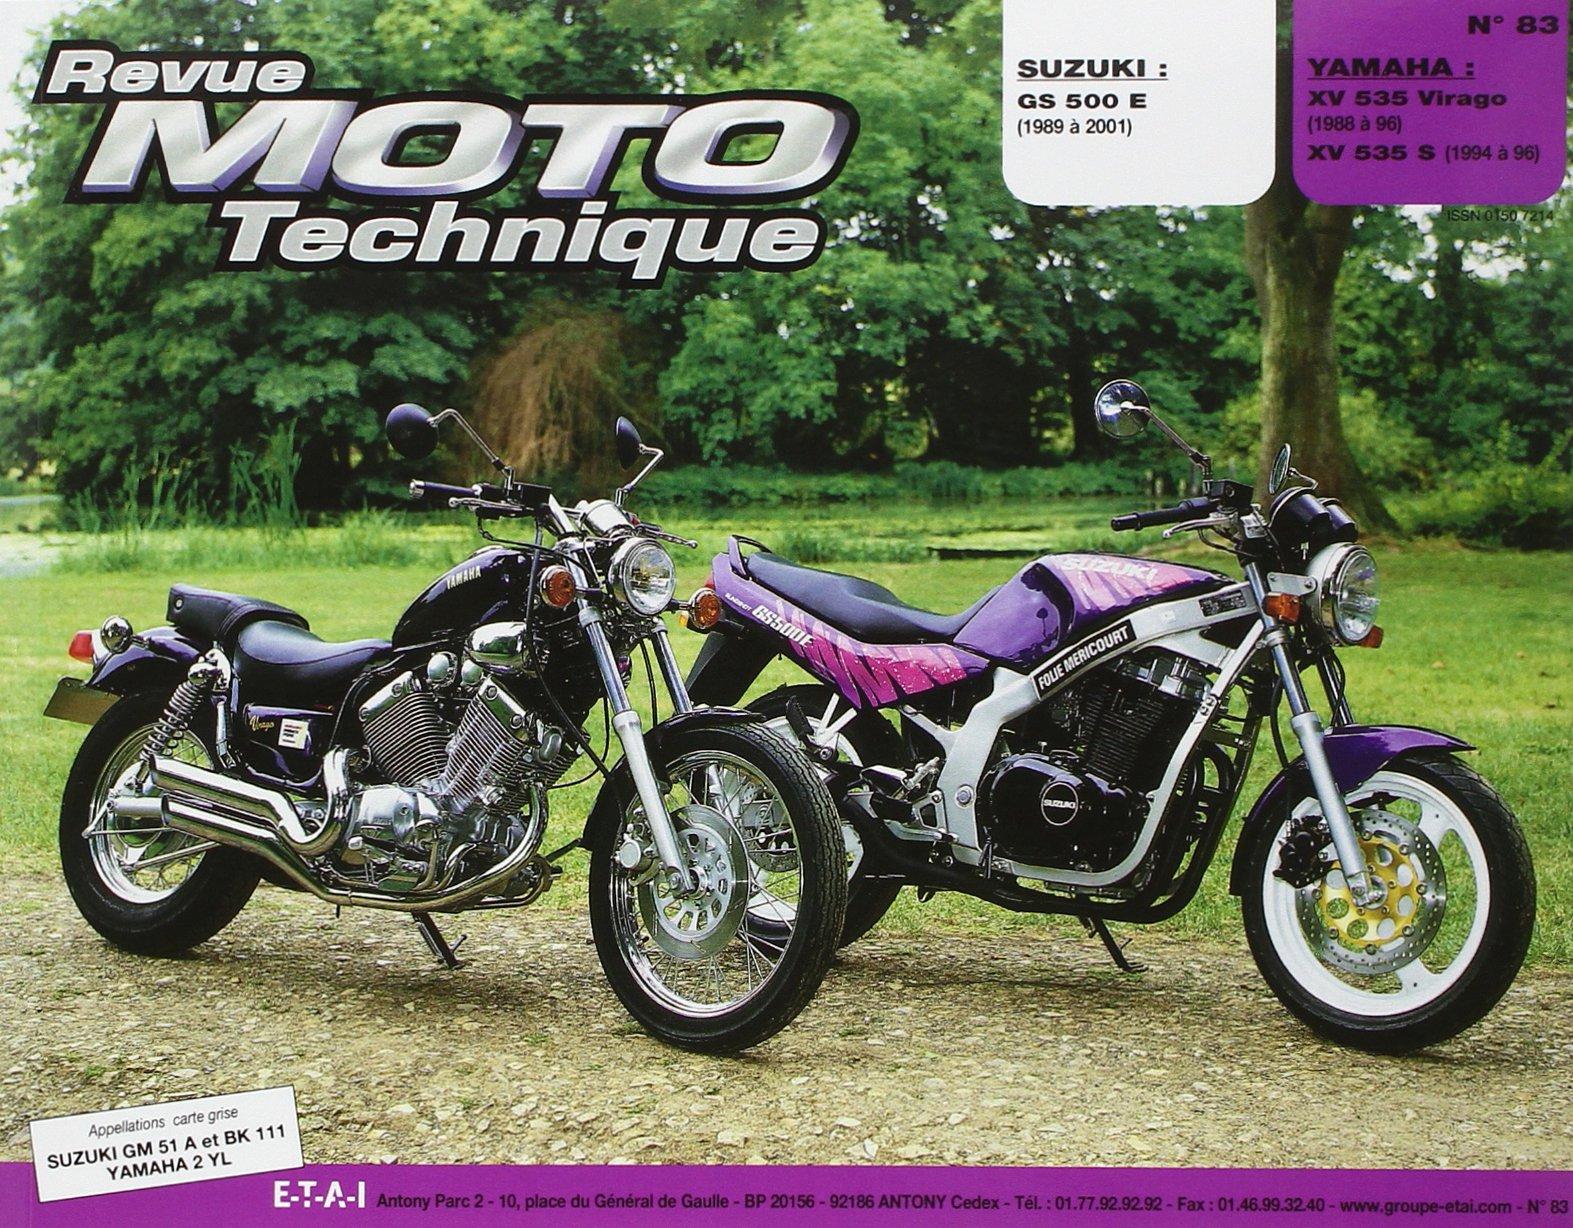 revue technique virago 535